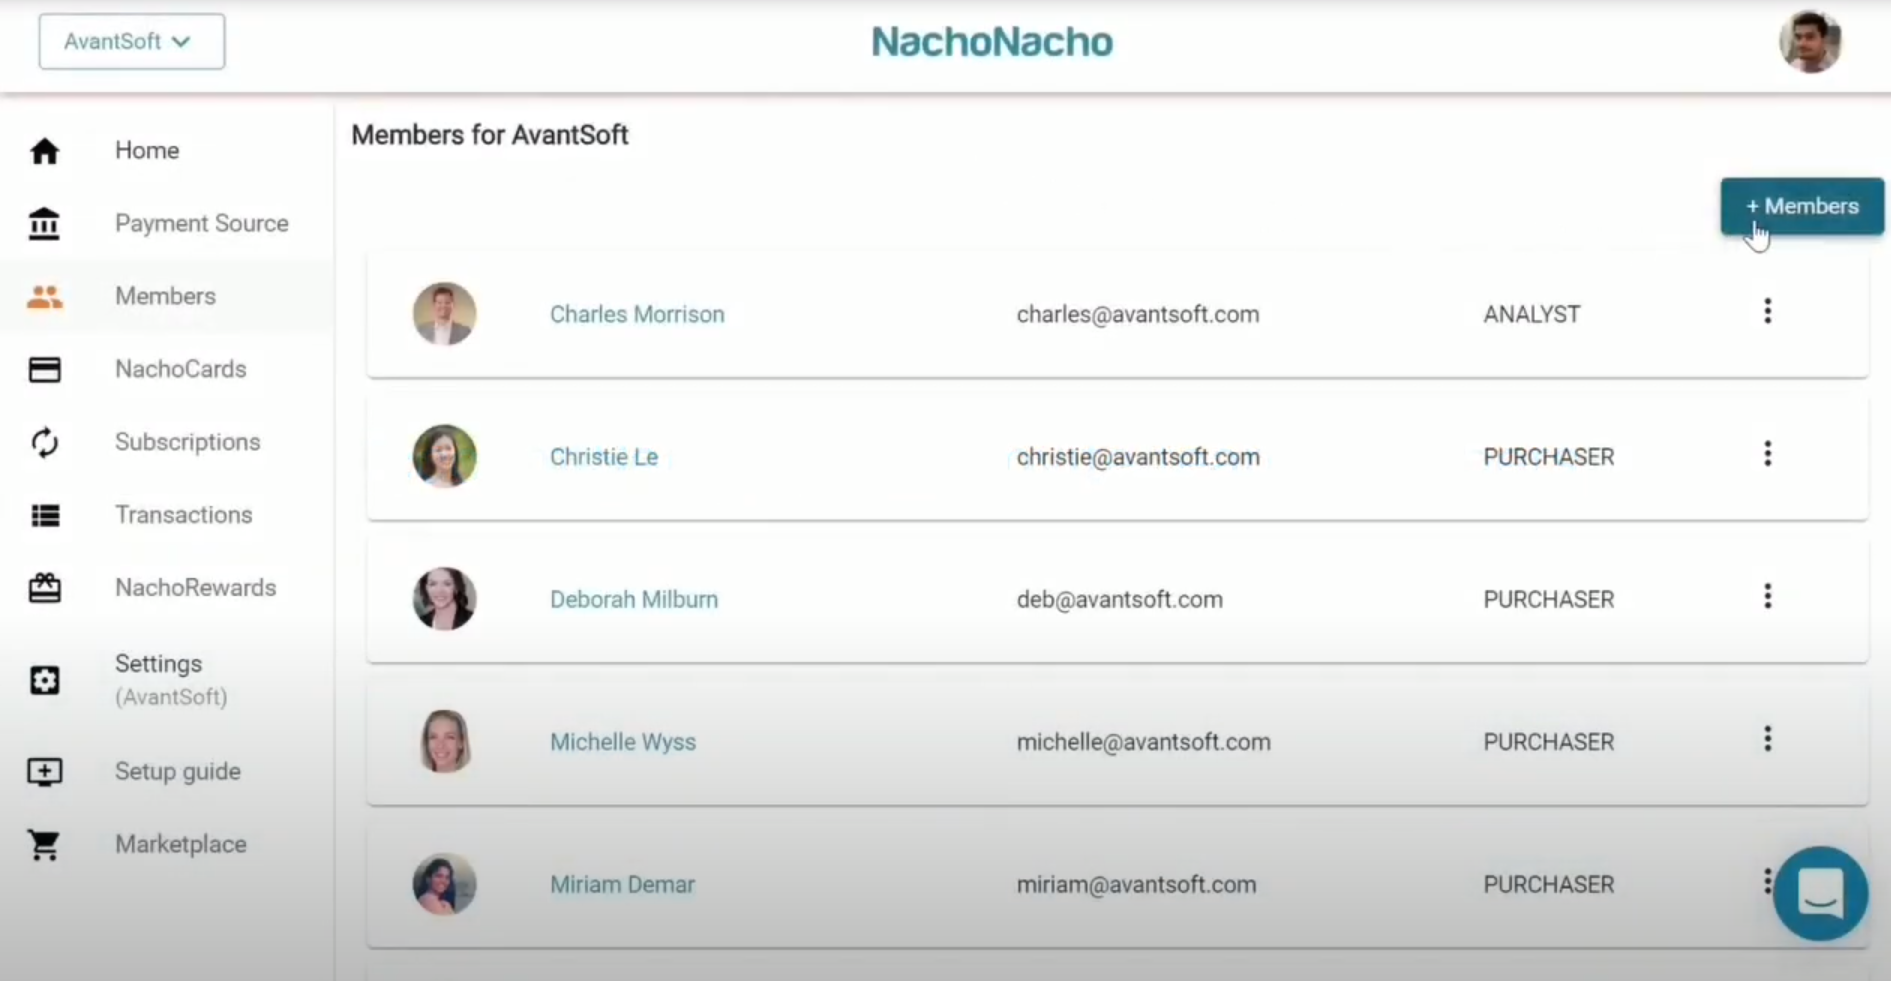 NachoNacho member details